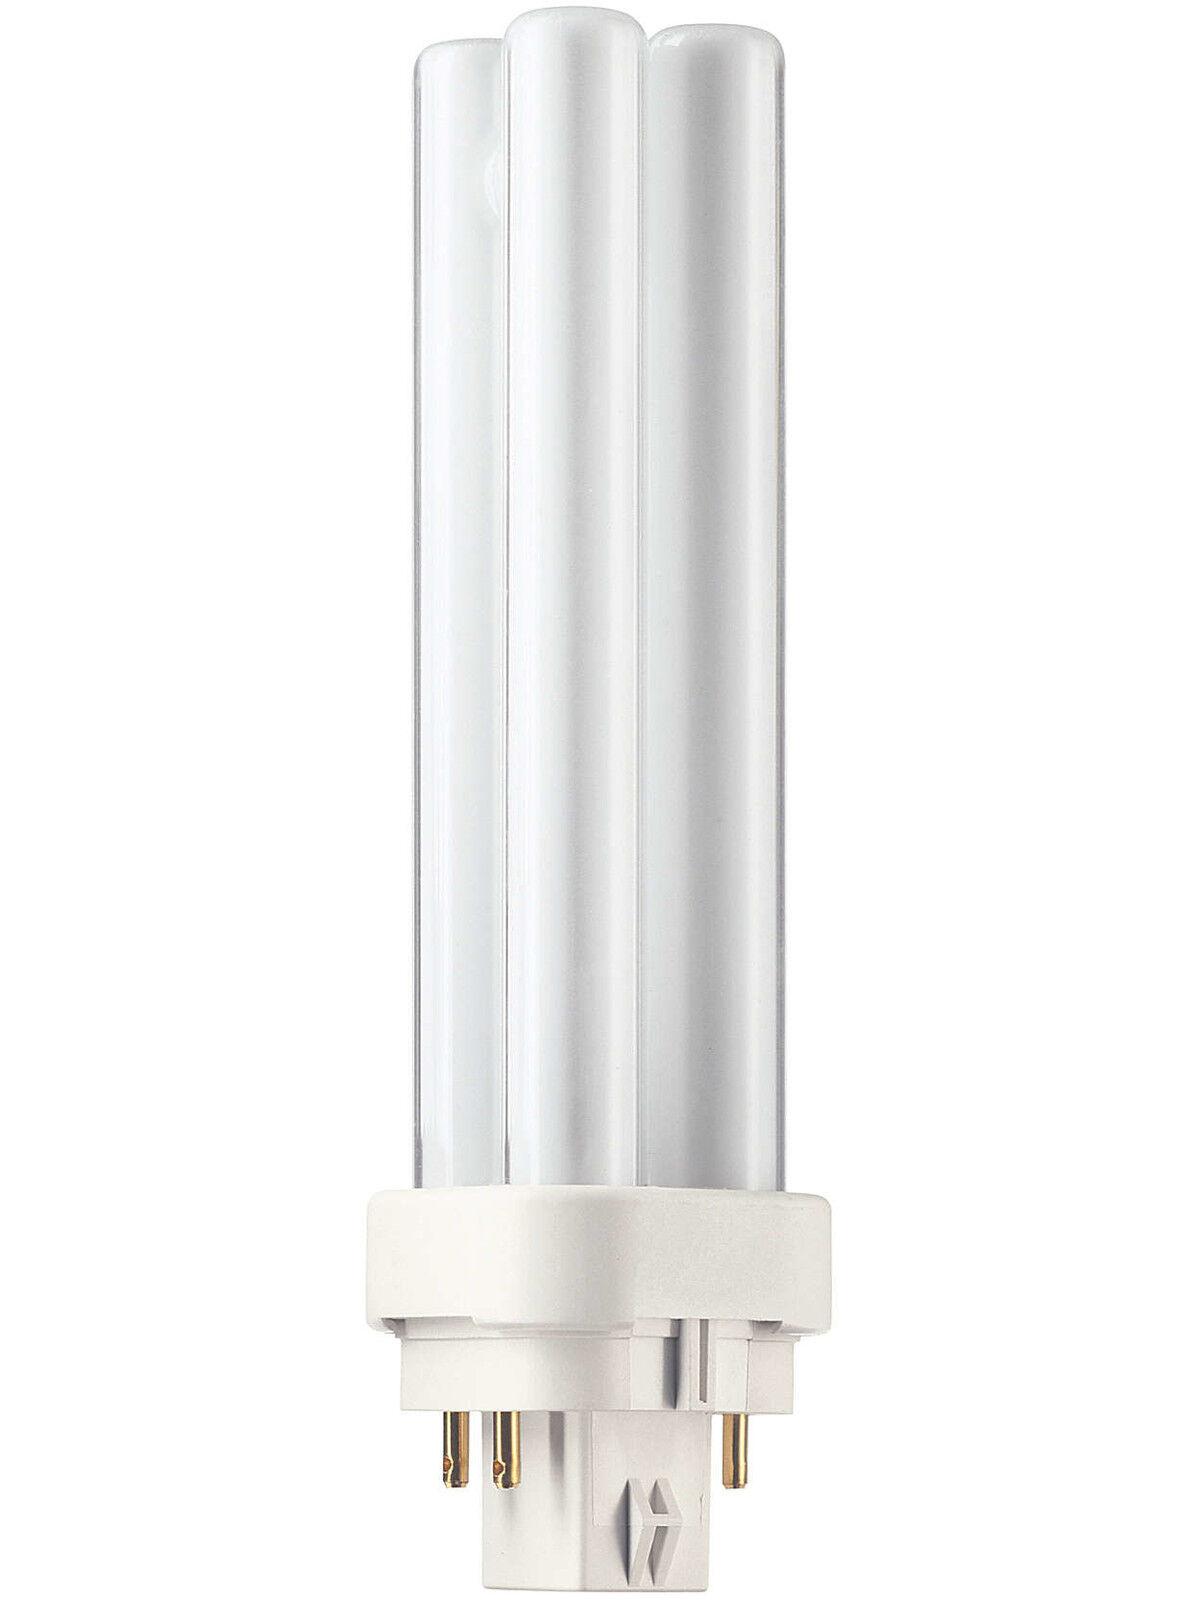 fluorescent amazon light bulb soft cri compact bulbs lights com lumens equal westinghouse cfl watt dp white